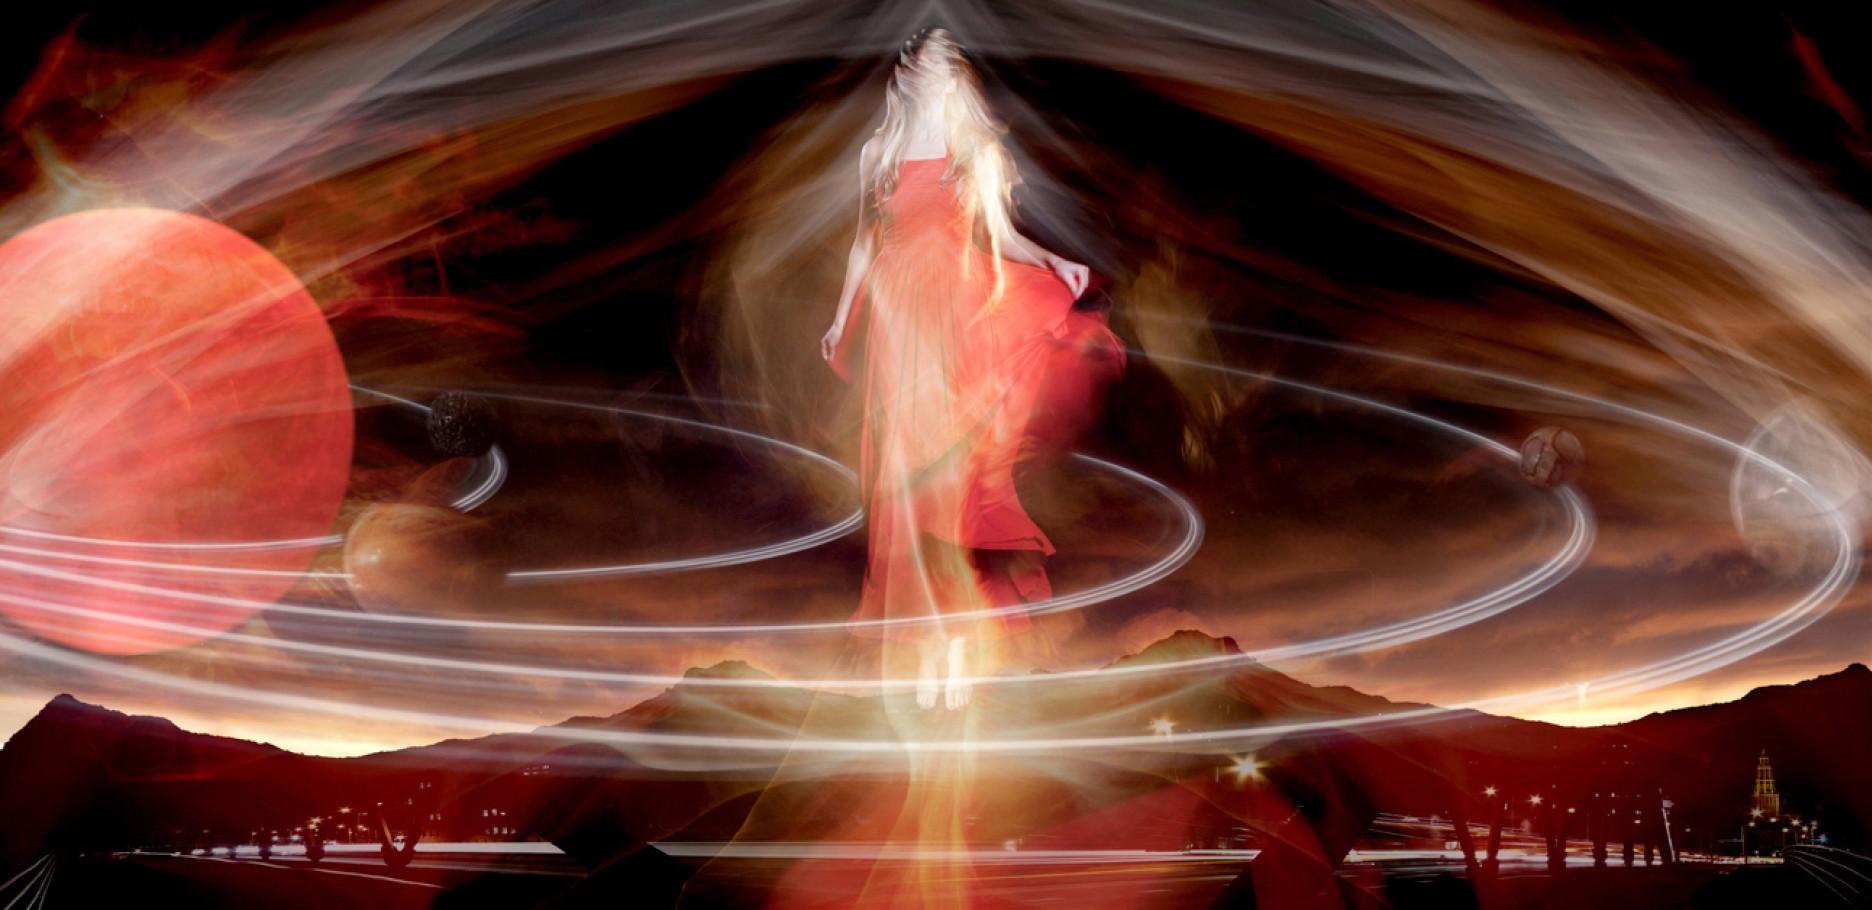 Transcendence - 2012